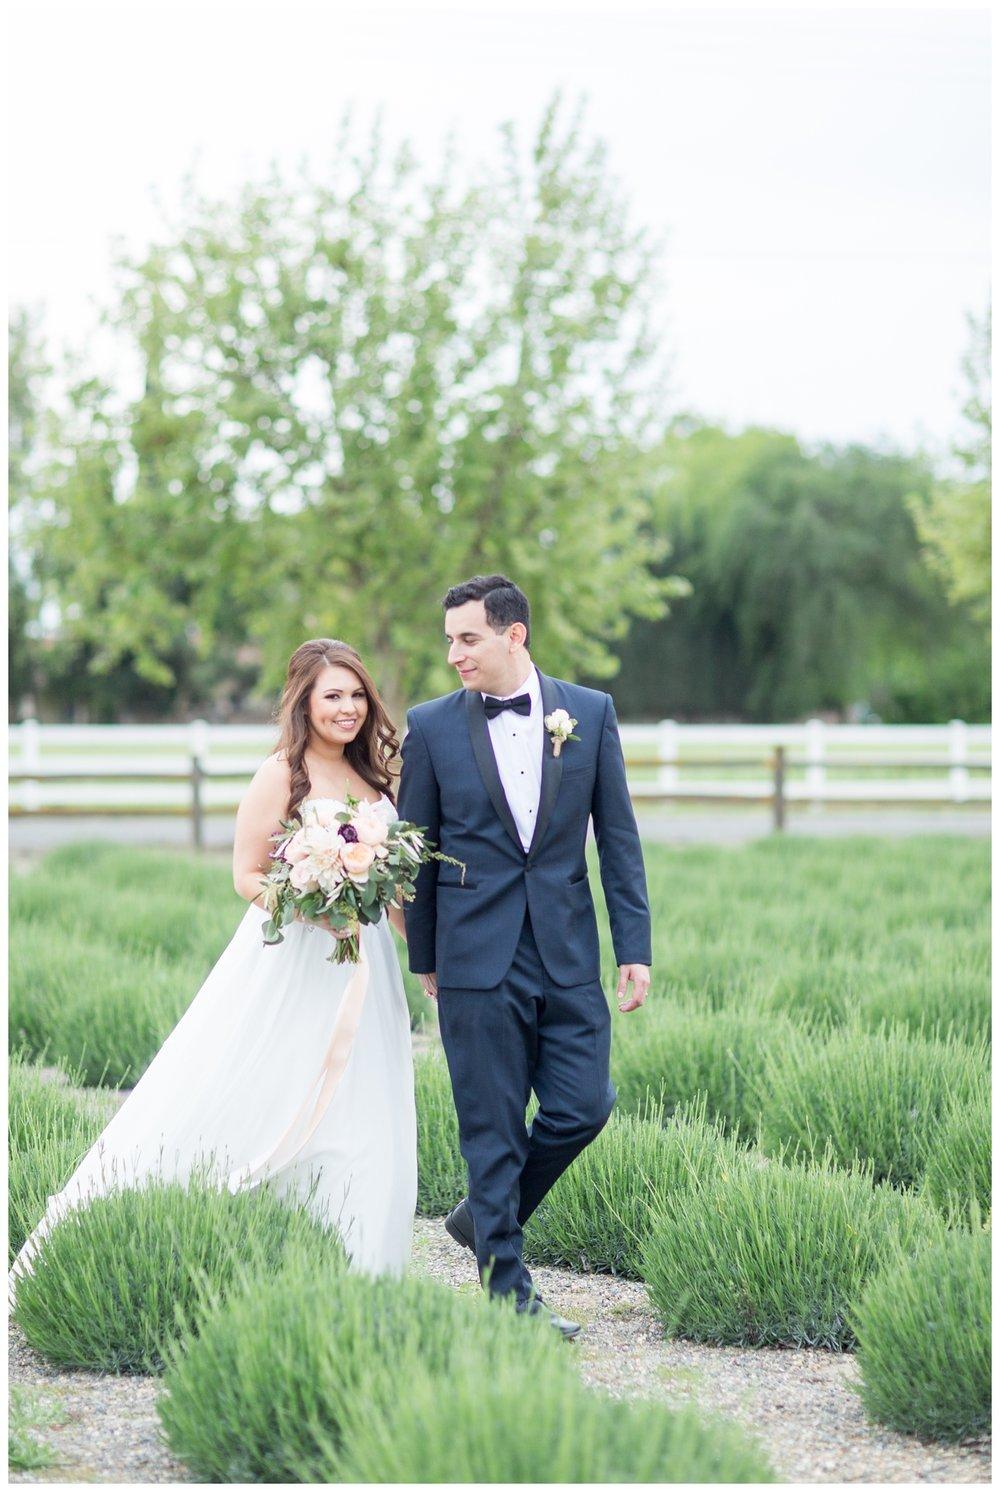 Pageo-Lavender-Farms-Wedding-Photos_4764.jpg